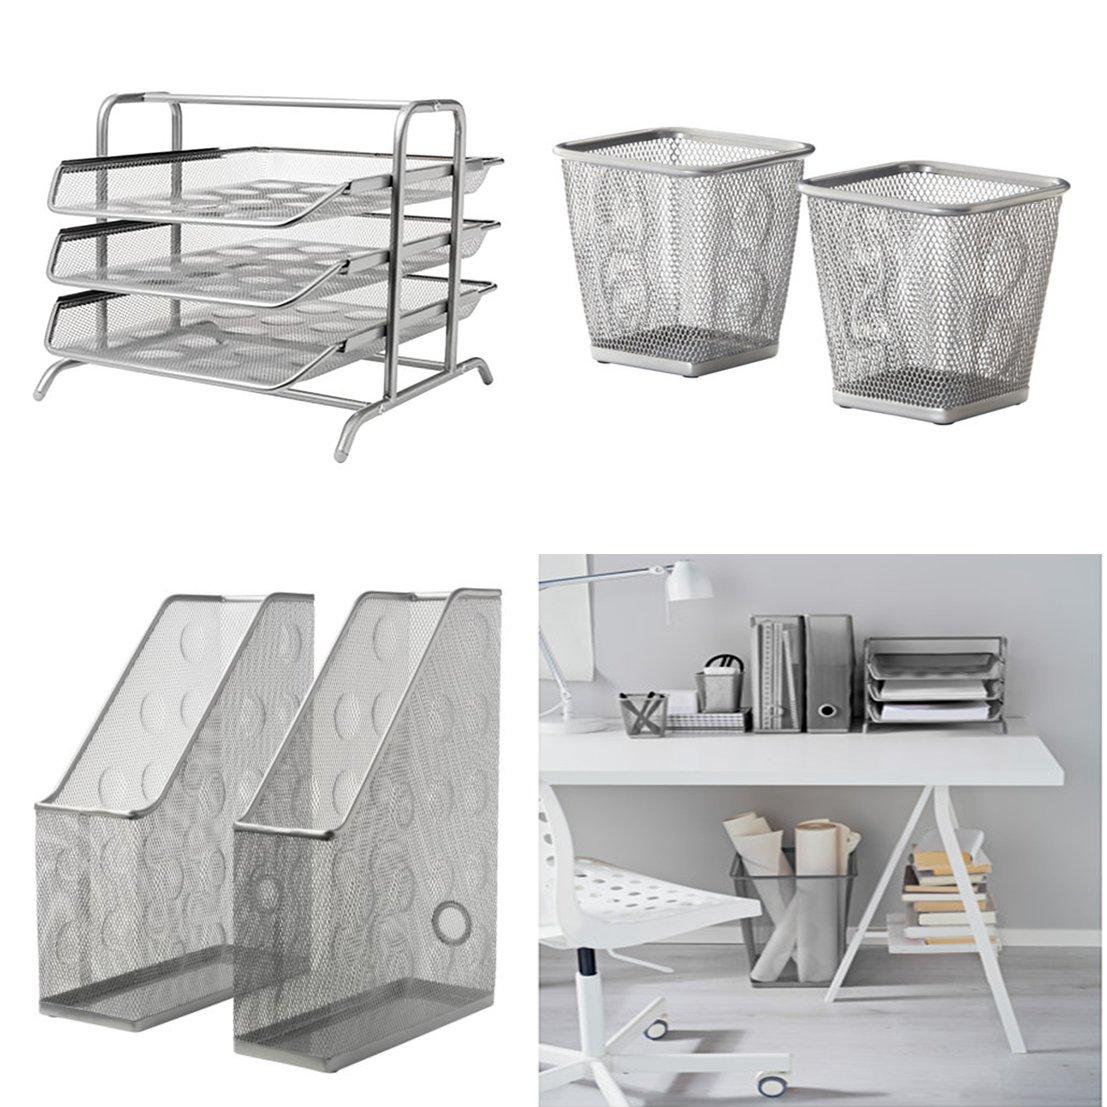 IKEA oficina/casa escritorio - 1 x carta bandeja DOKUMENT (plata), 2 x lápiz Copa DOKUMENT (plata), 2 x revista Archivo DOKUMENT (plata): Amazon.es: Oficina ...